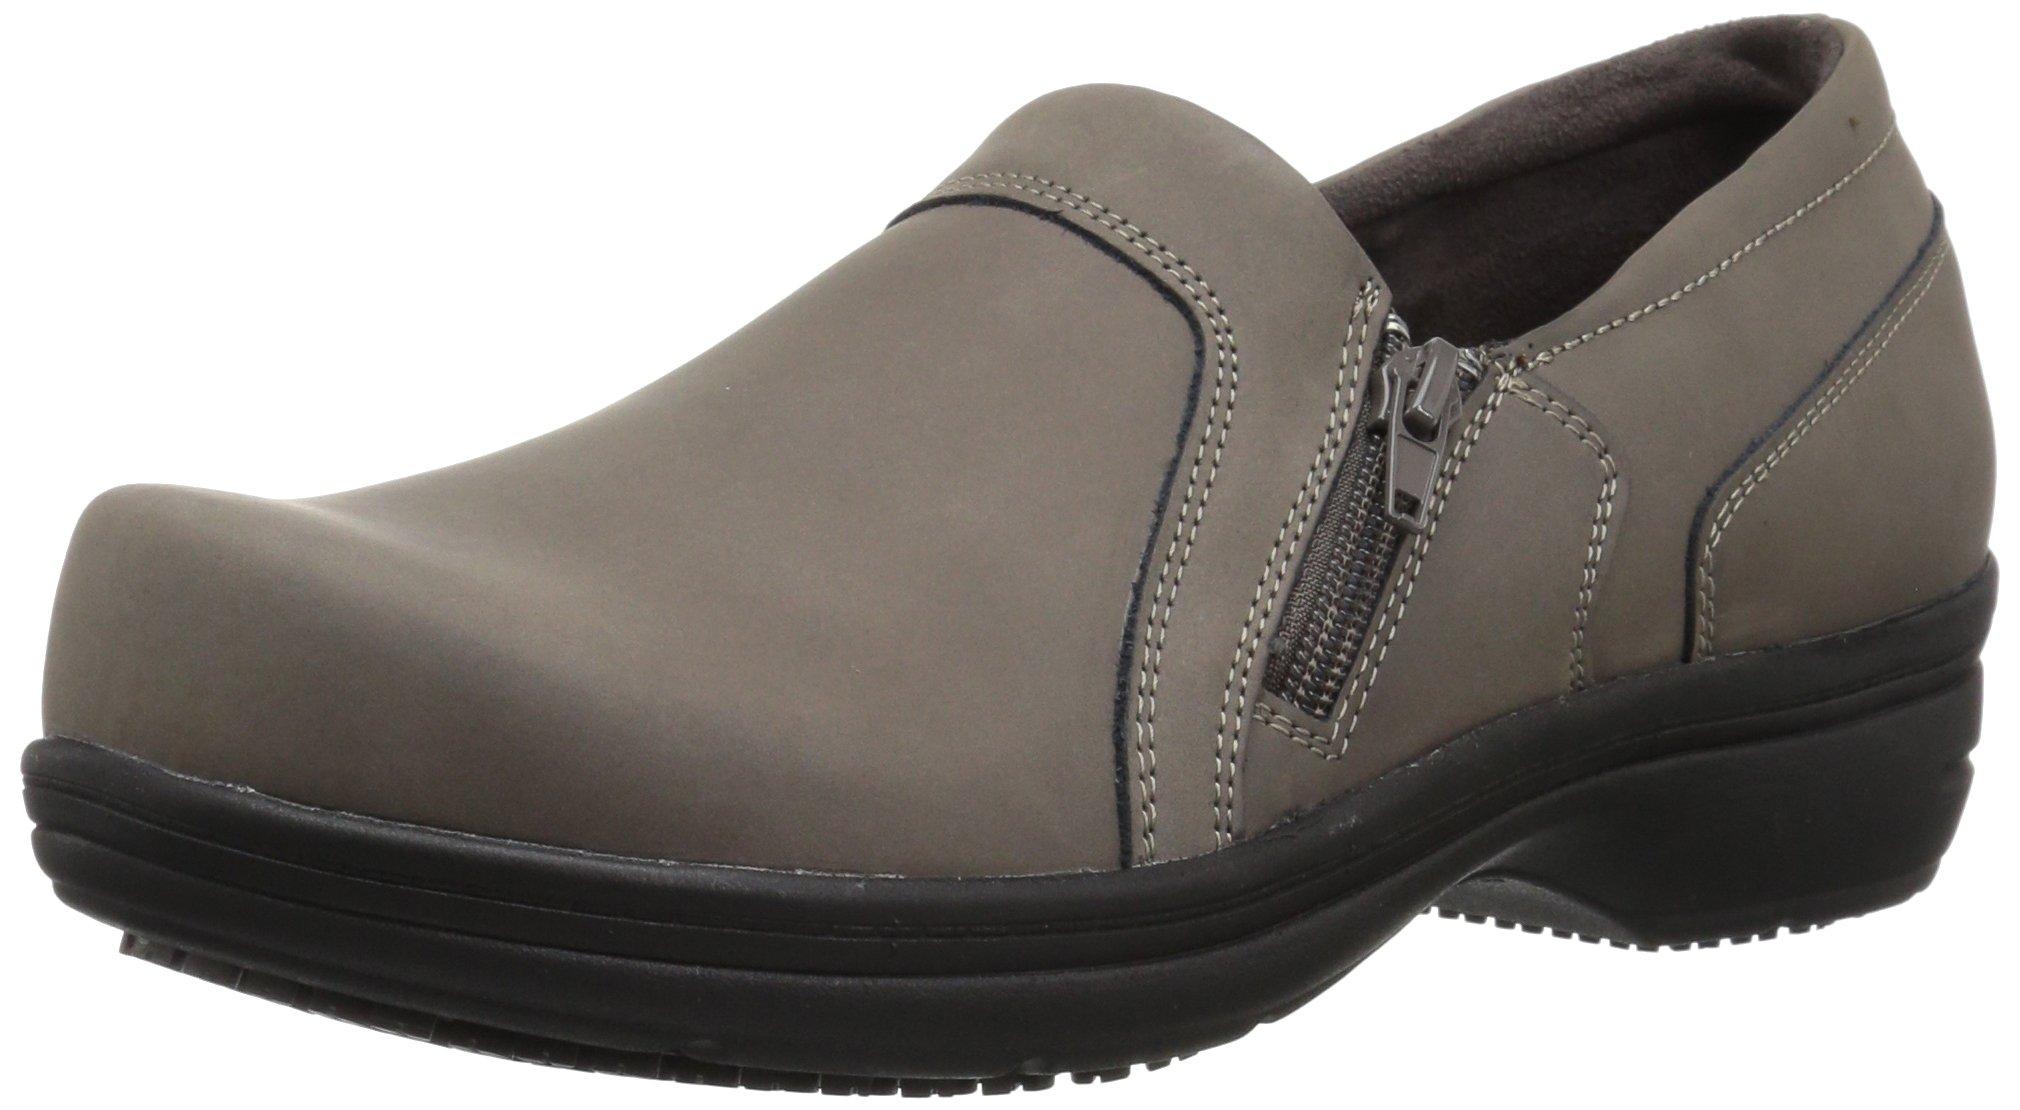 Easy Works Women's Bentley Health Care Professional Shoe, Grey Nubuck, 7.5 W US